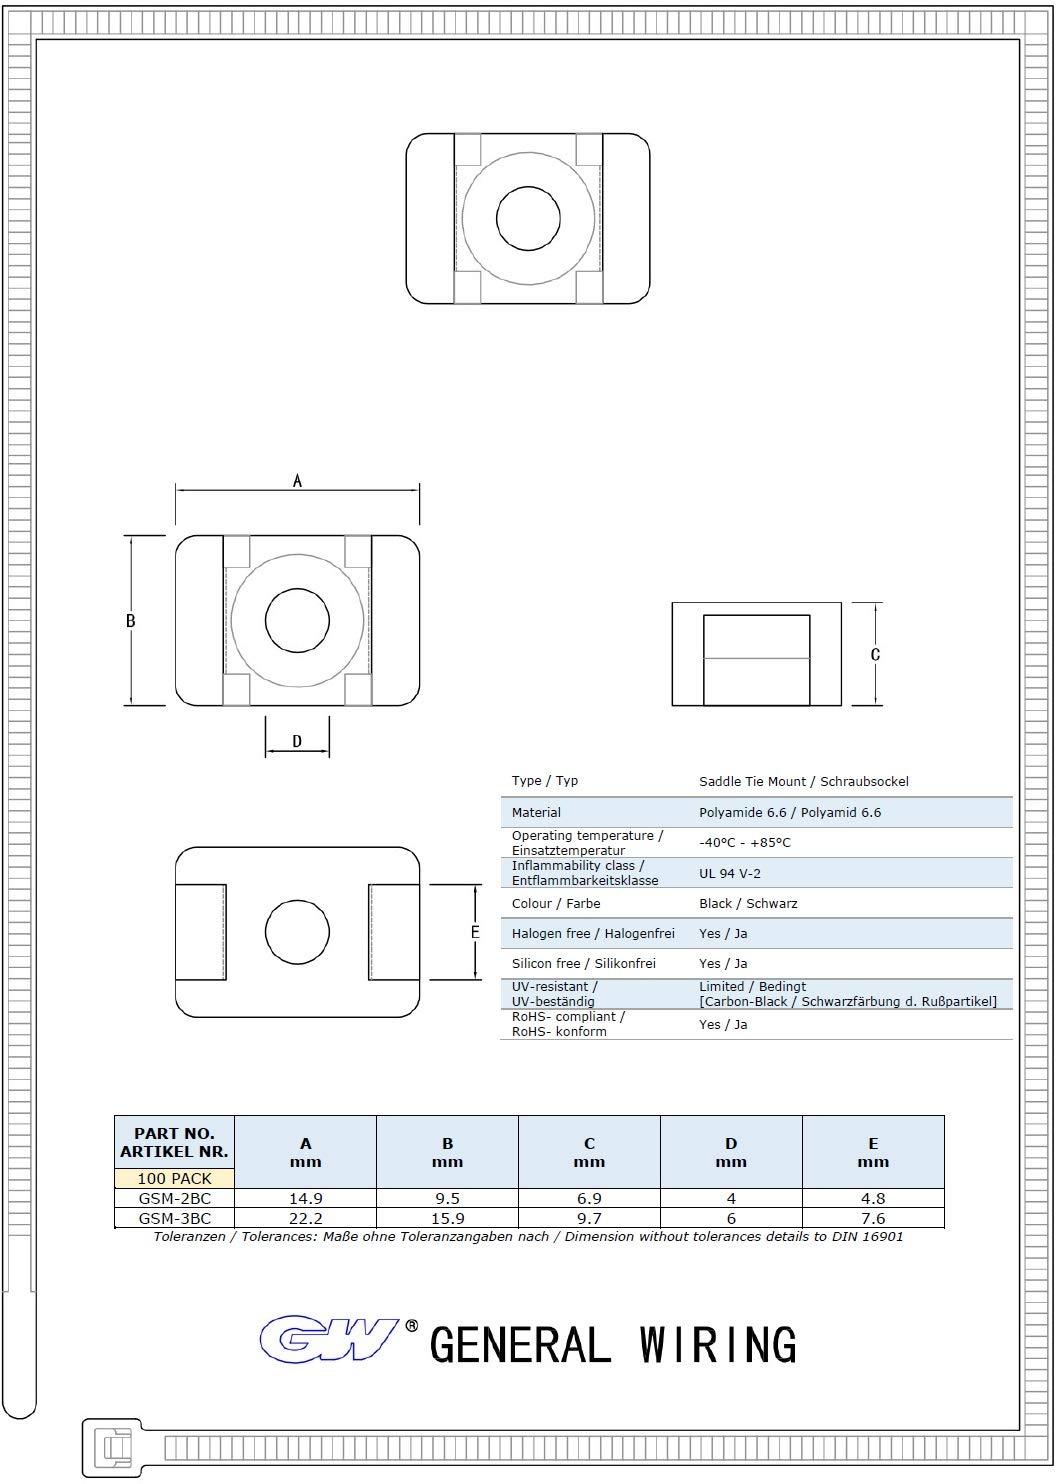 schwarz GW Kabelbinder-Technik Schraubsockel 14.9 x 9.5 x 6.9 mm 100 St/ück GSM-2BC